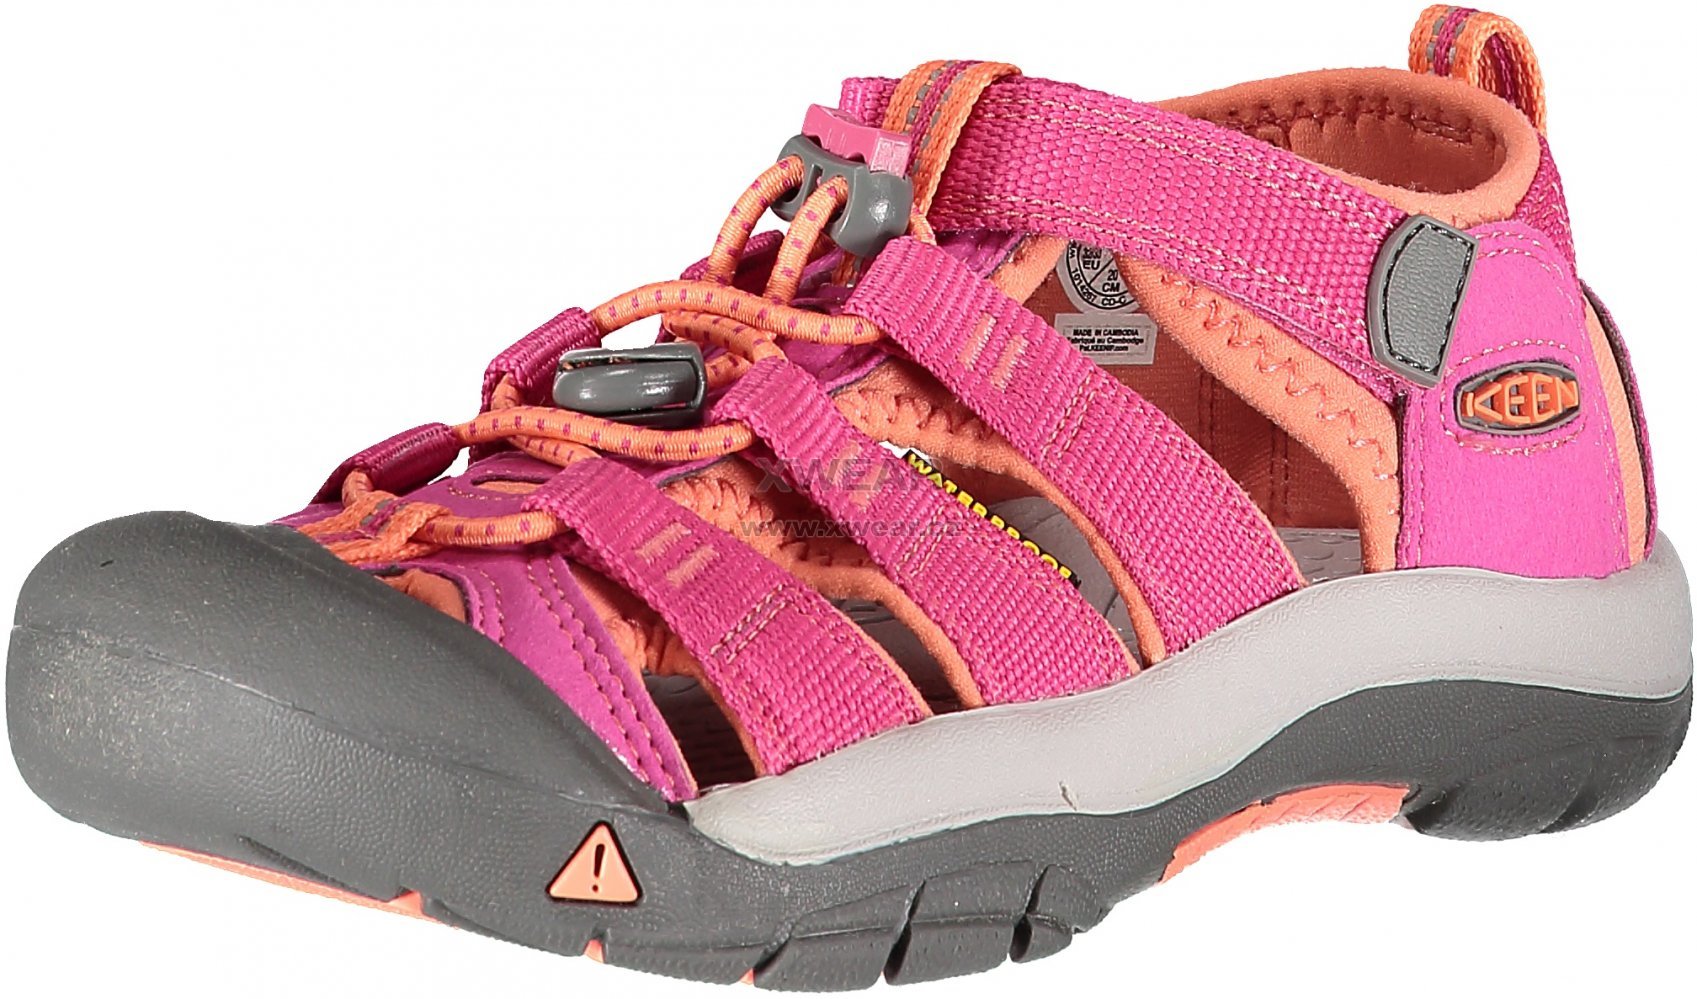 2eeb60c380b1 Dětské sandále KEEN NEWPORT H2 JR VERY BERRY FUSION CORAL velikost ...